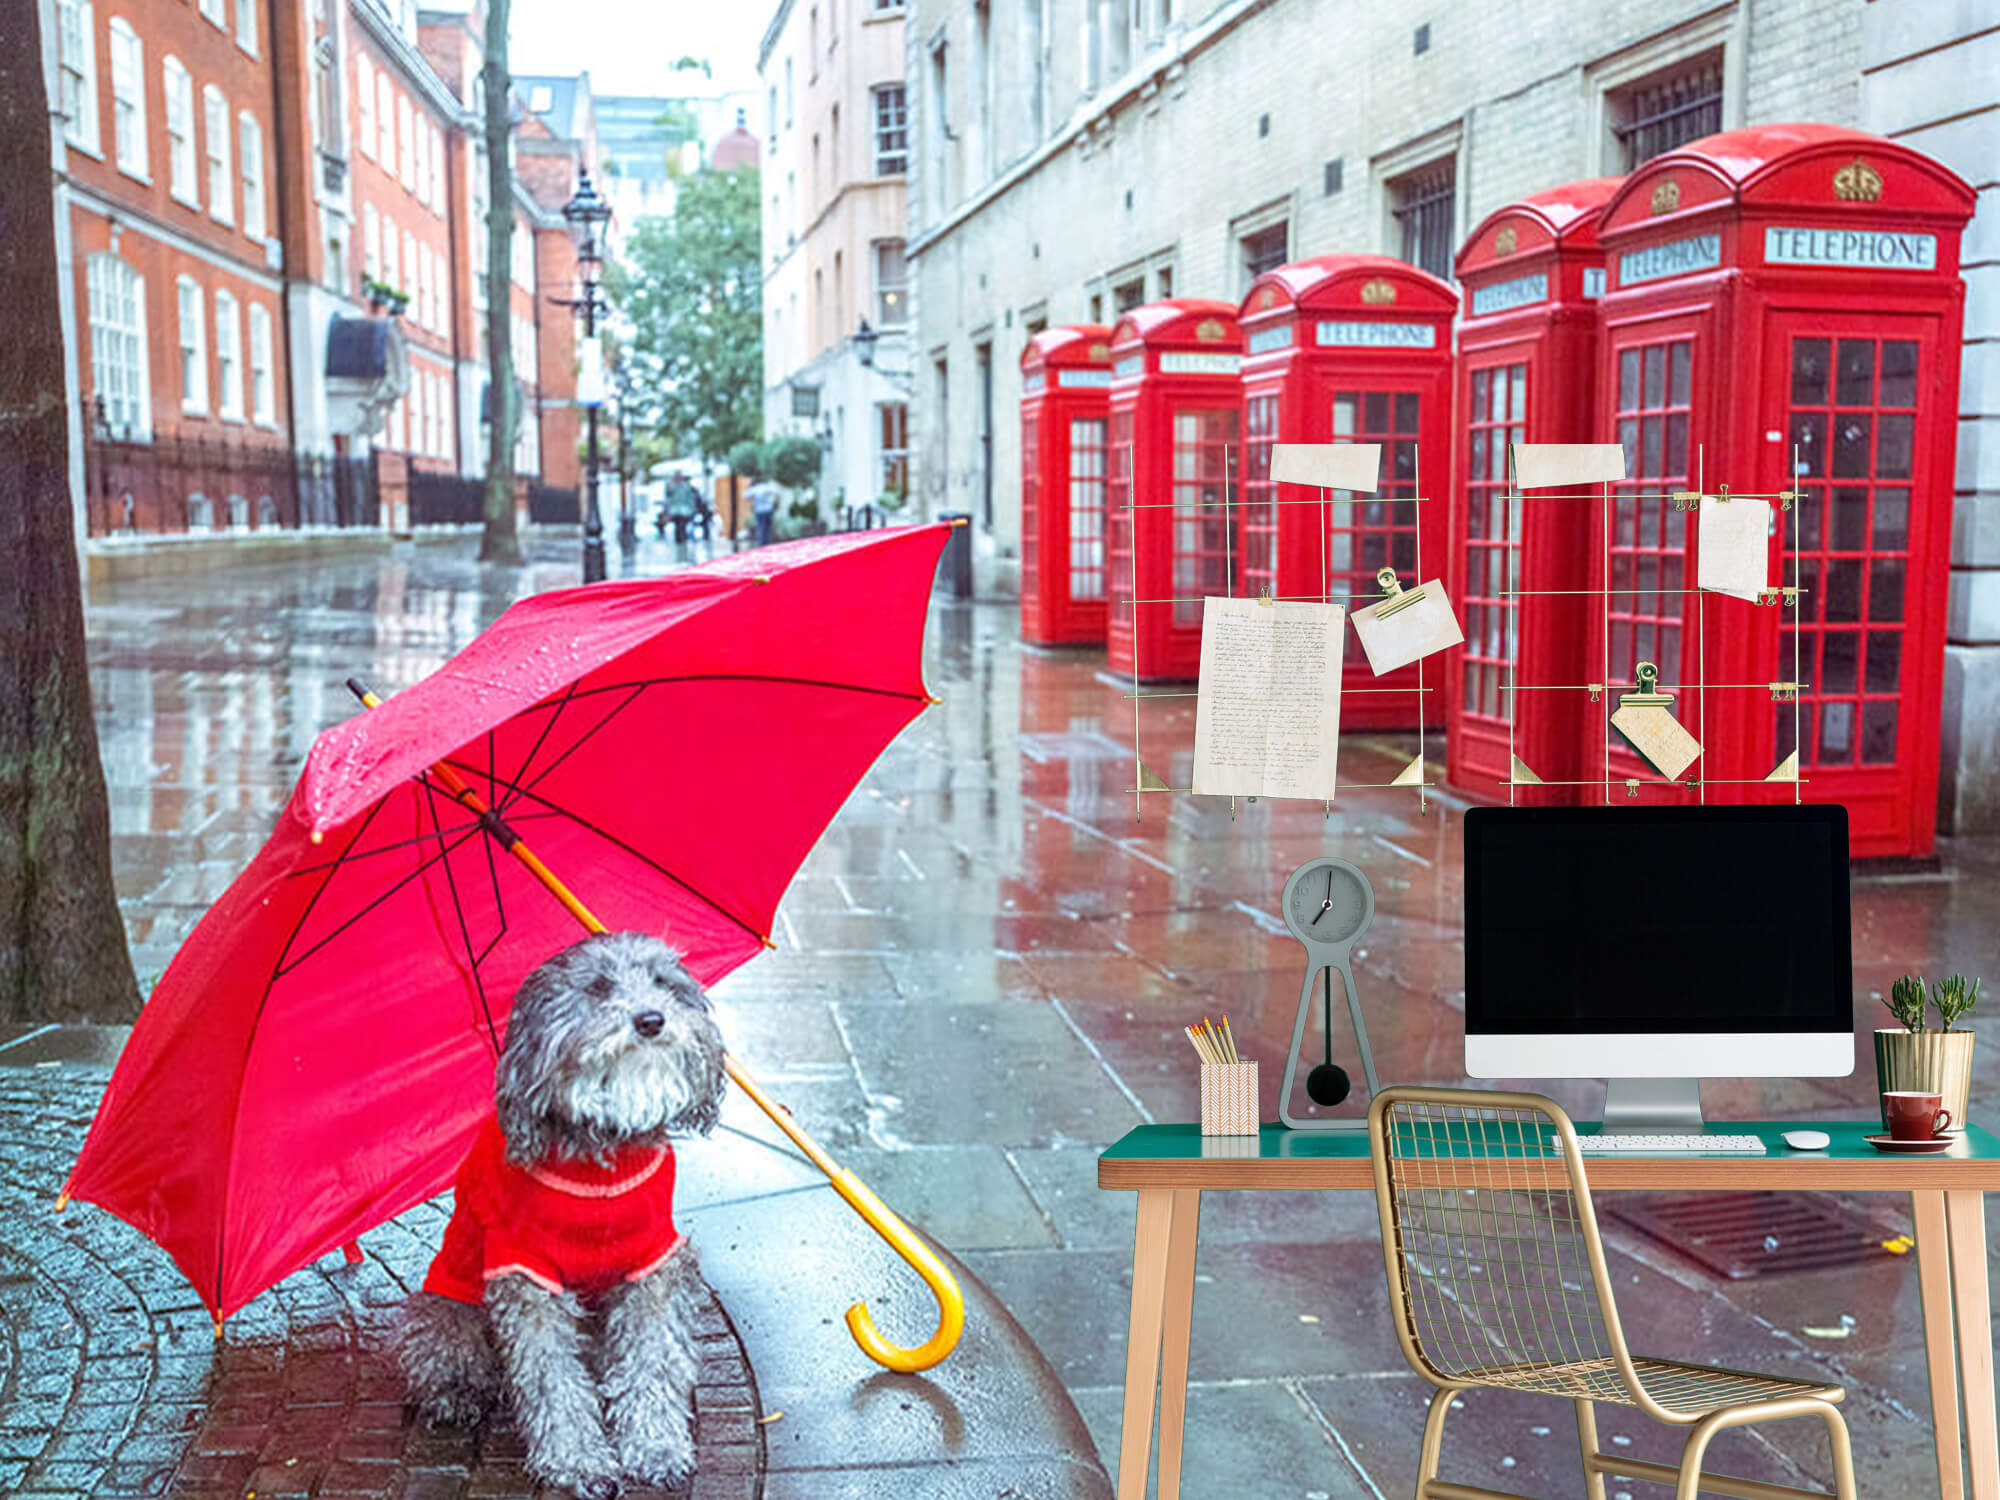 Hond met paraplu 7